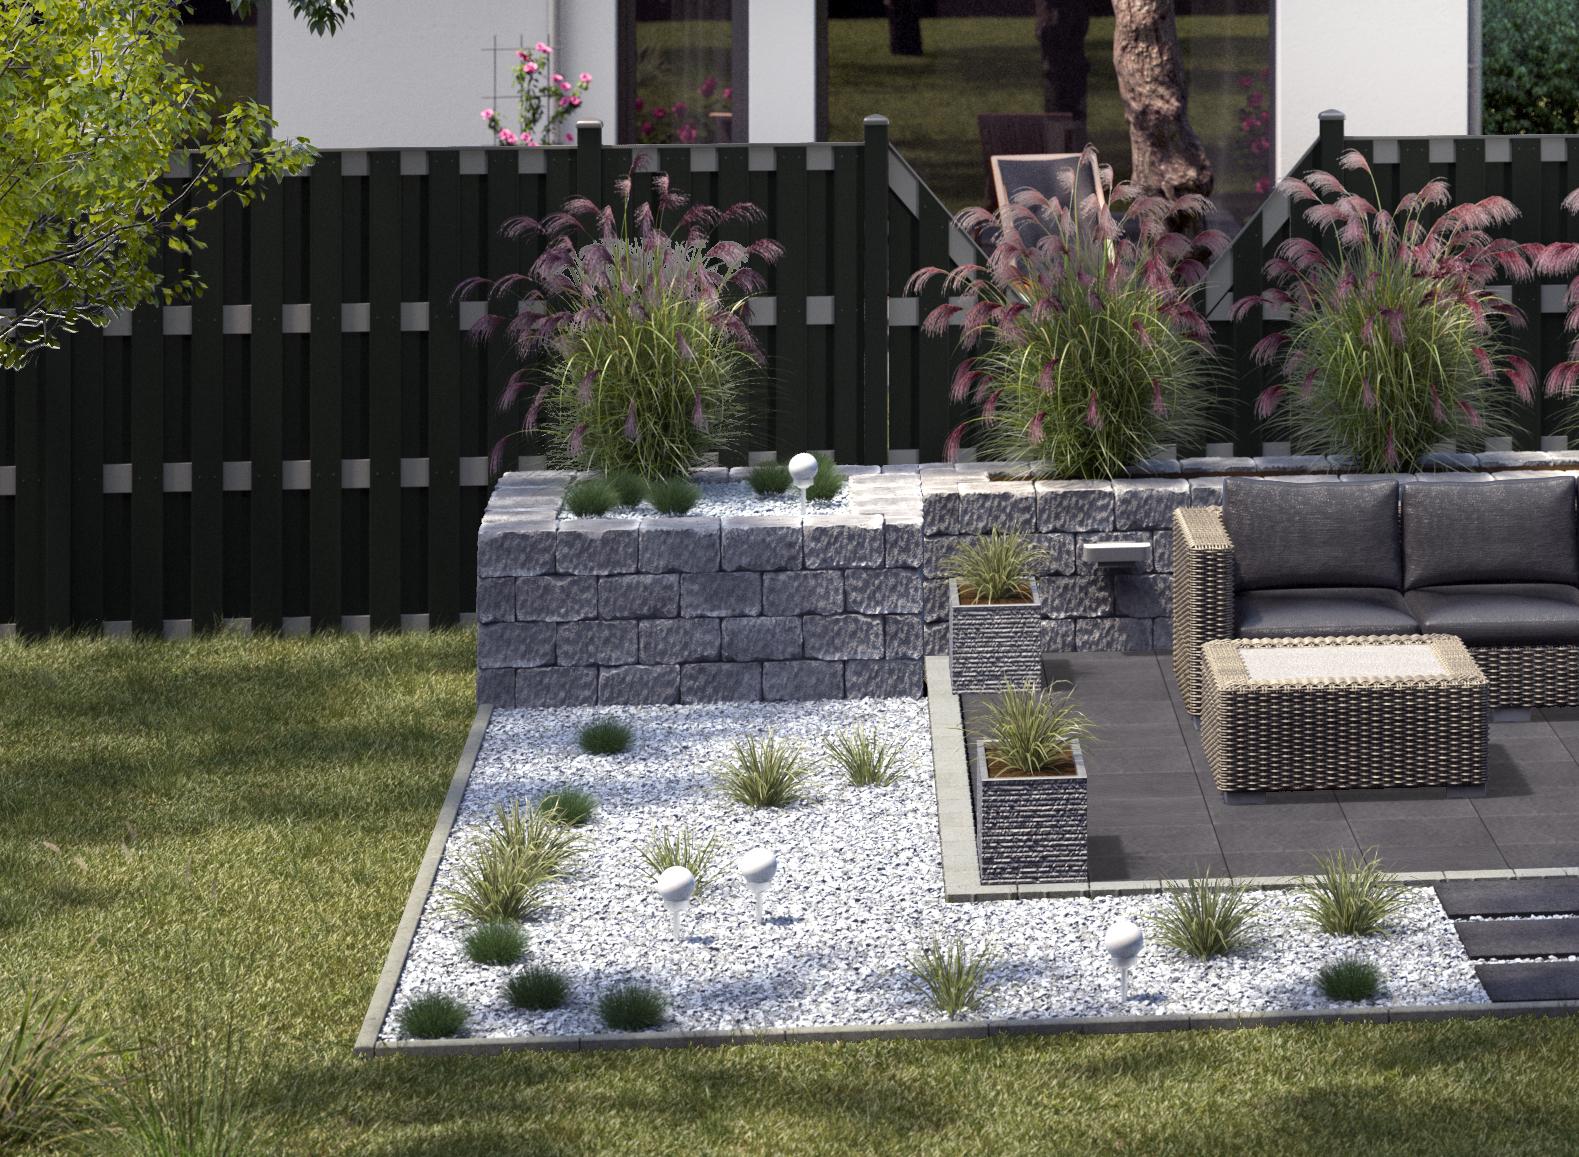 20 Genial Kleinen Garten Gestalten Ideen | Garten Deko